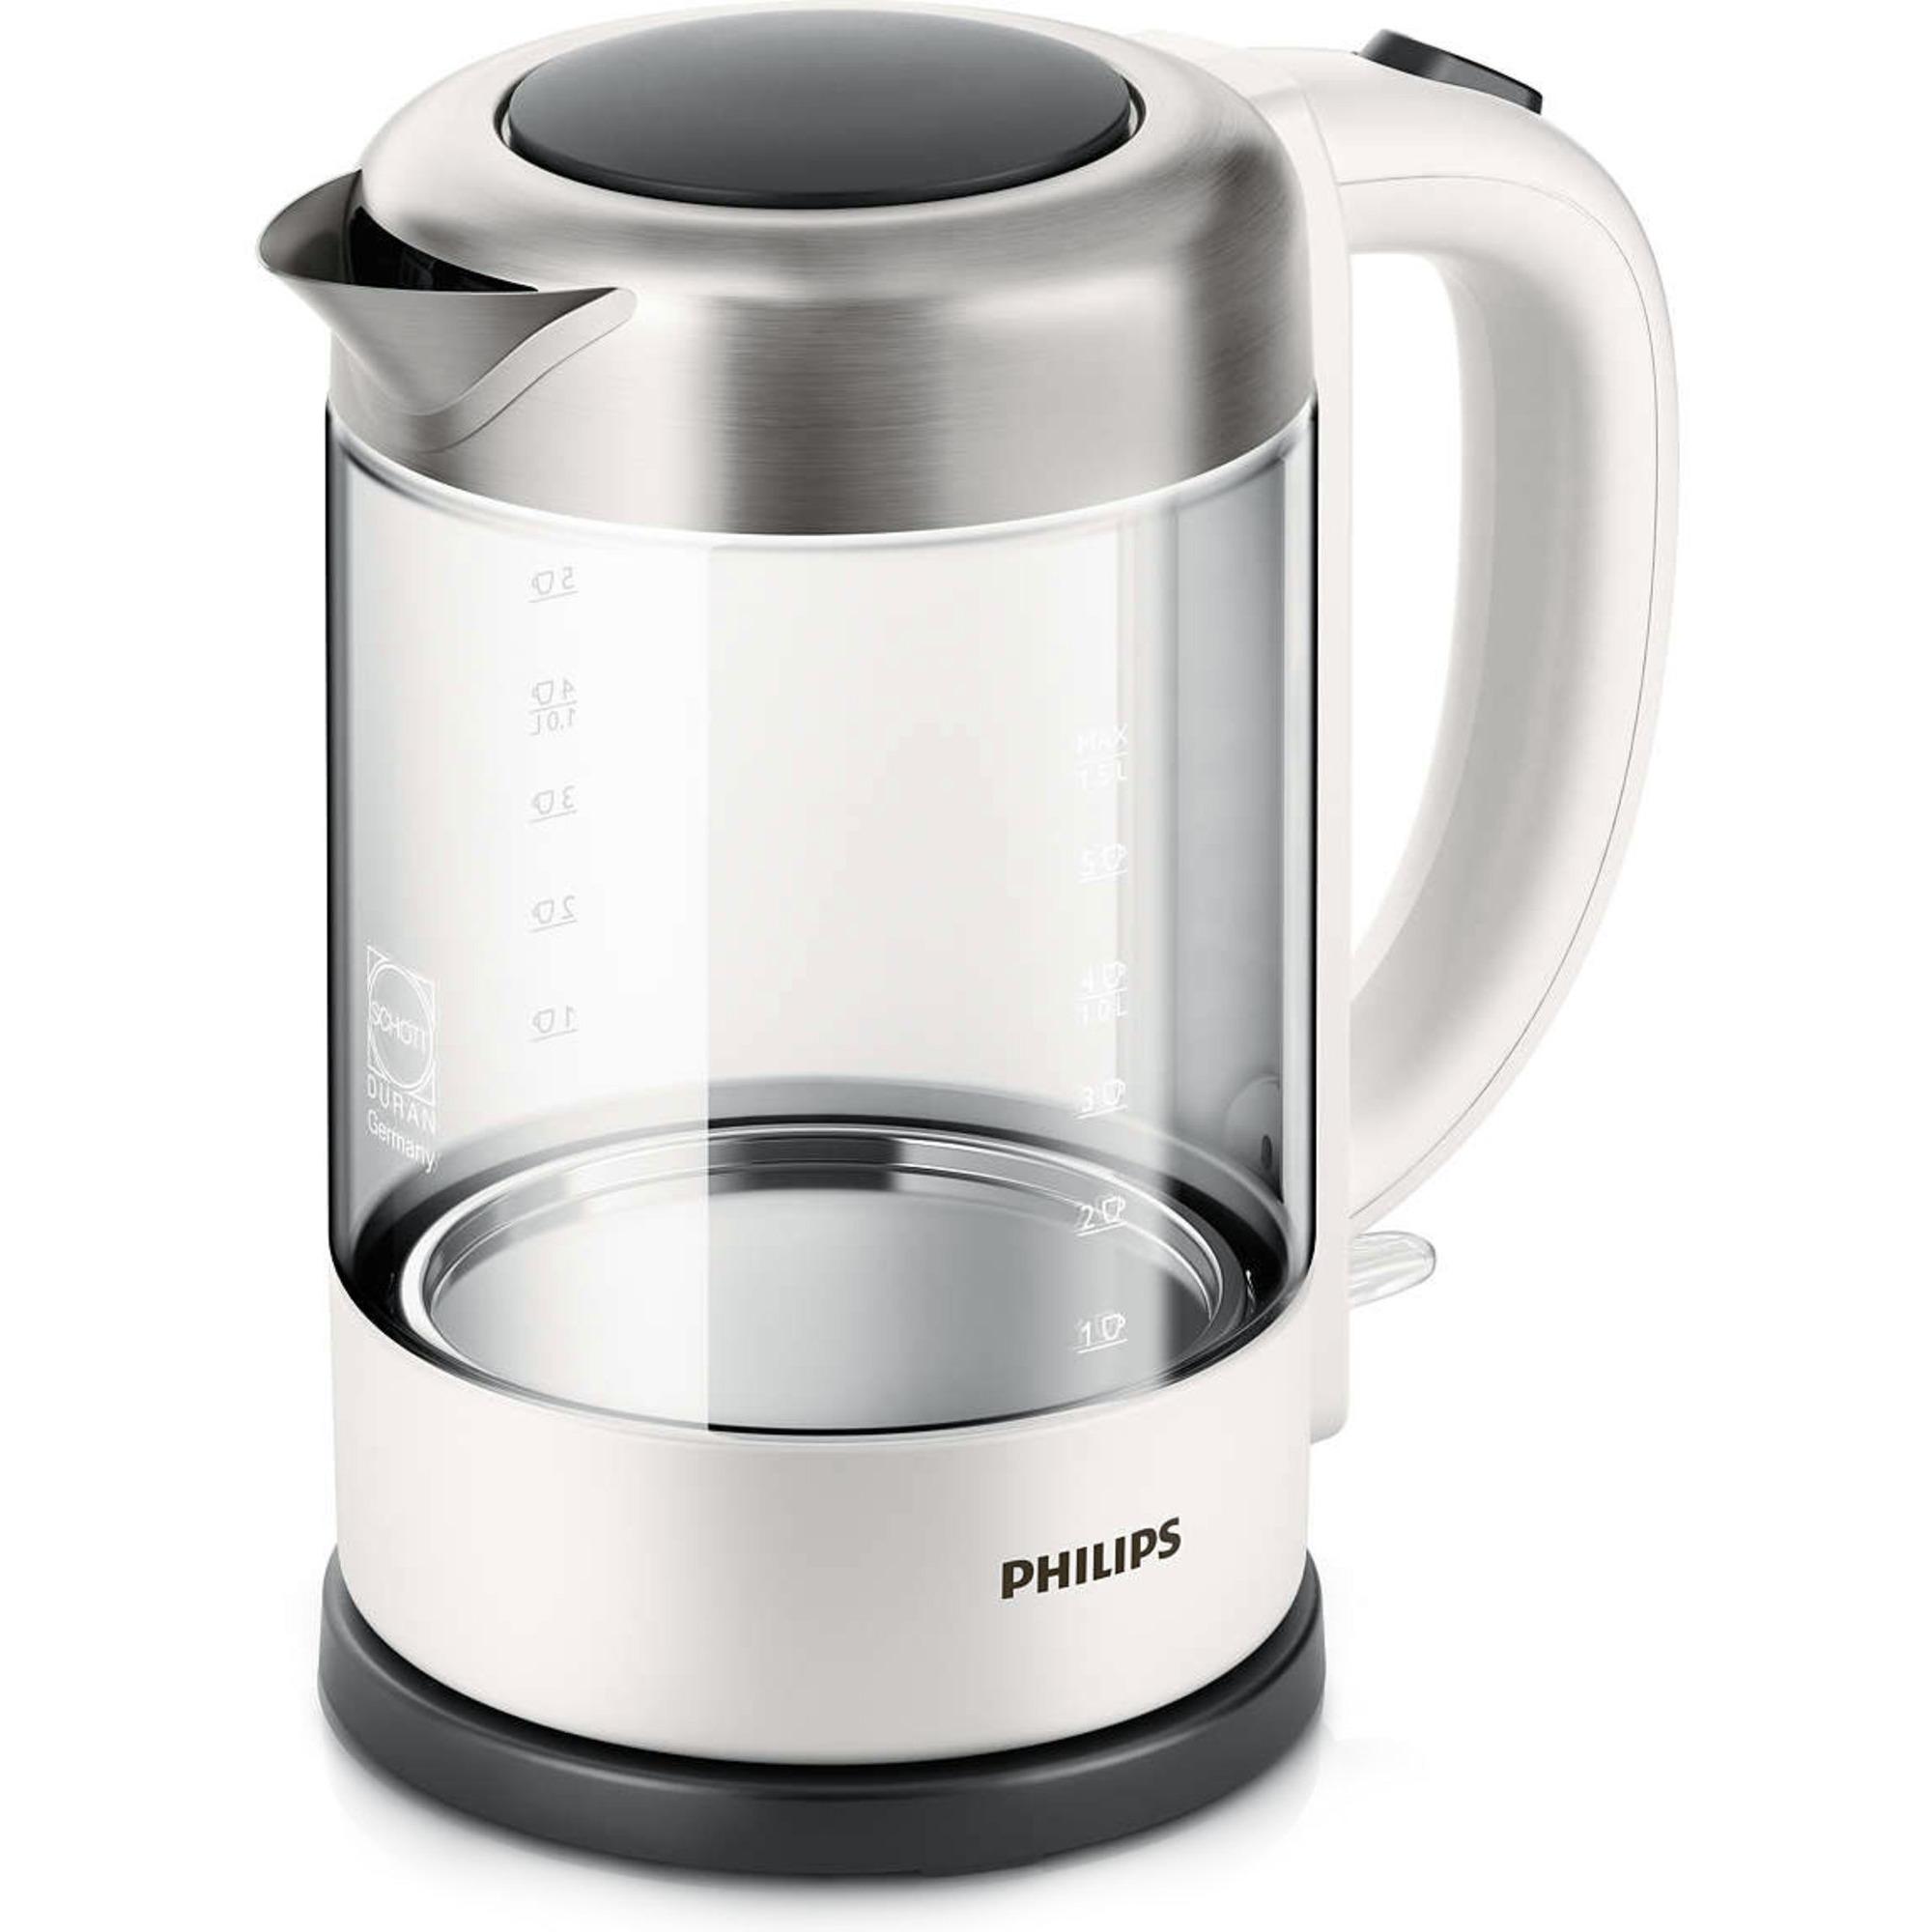 Philips HD9340/00 Vattenkokare glas 15 liter